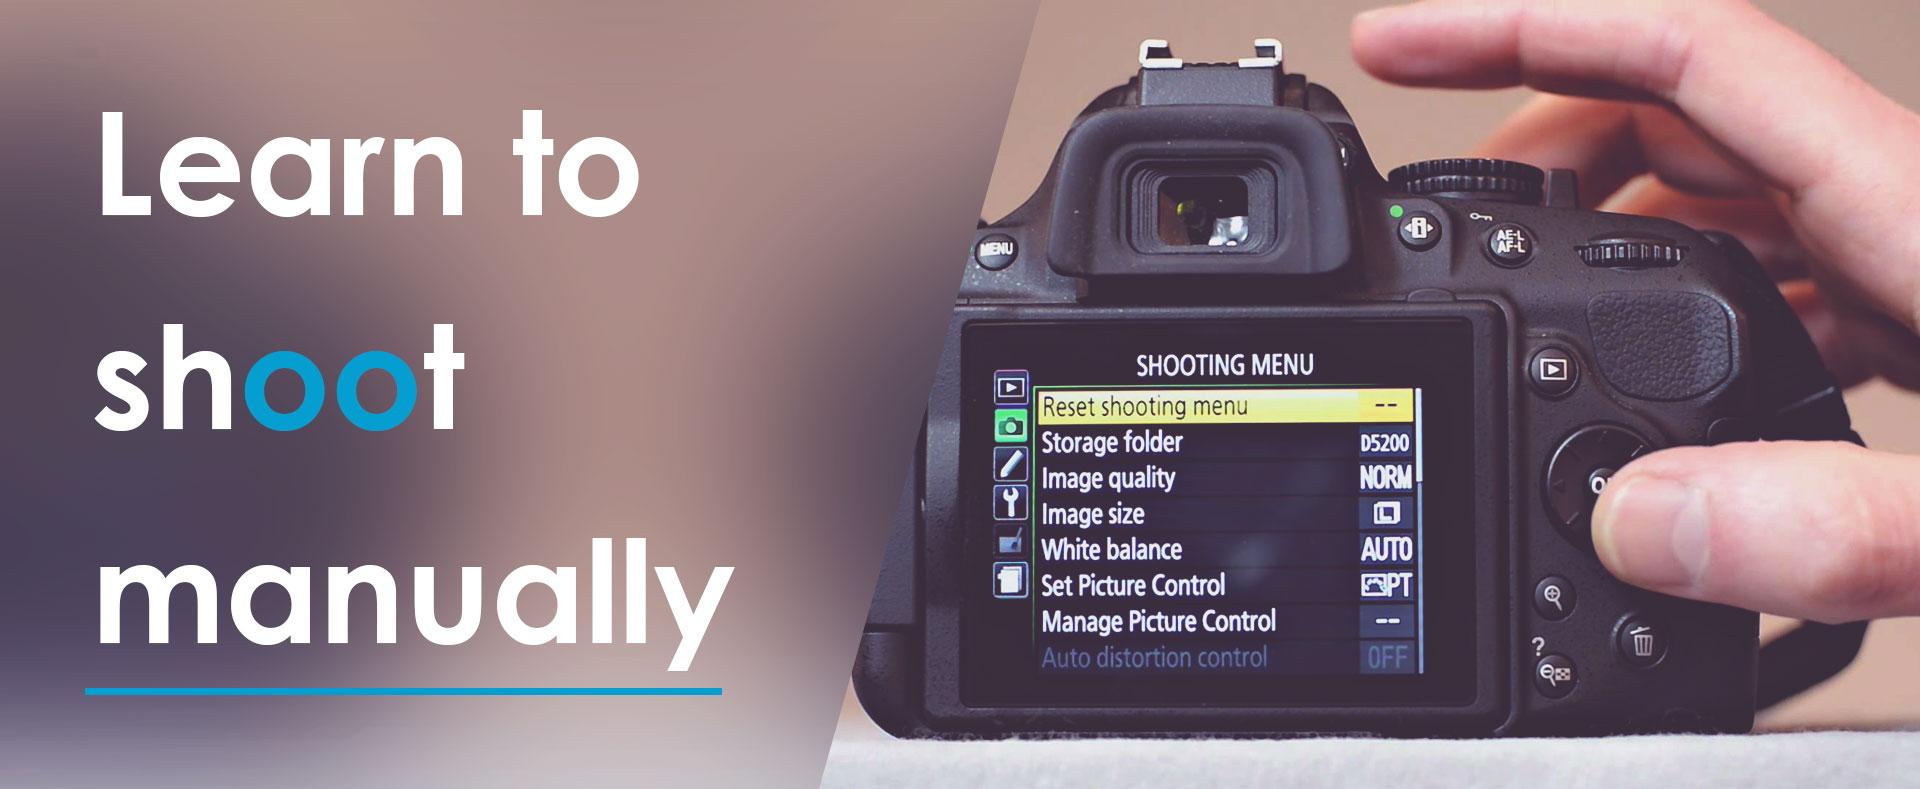 learn-to-shoot-manually